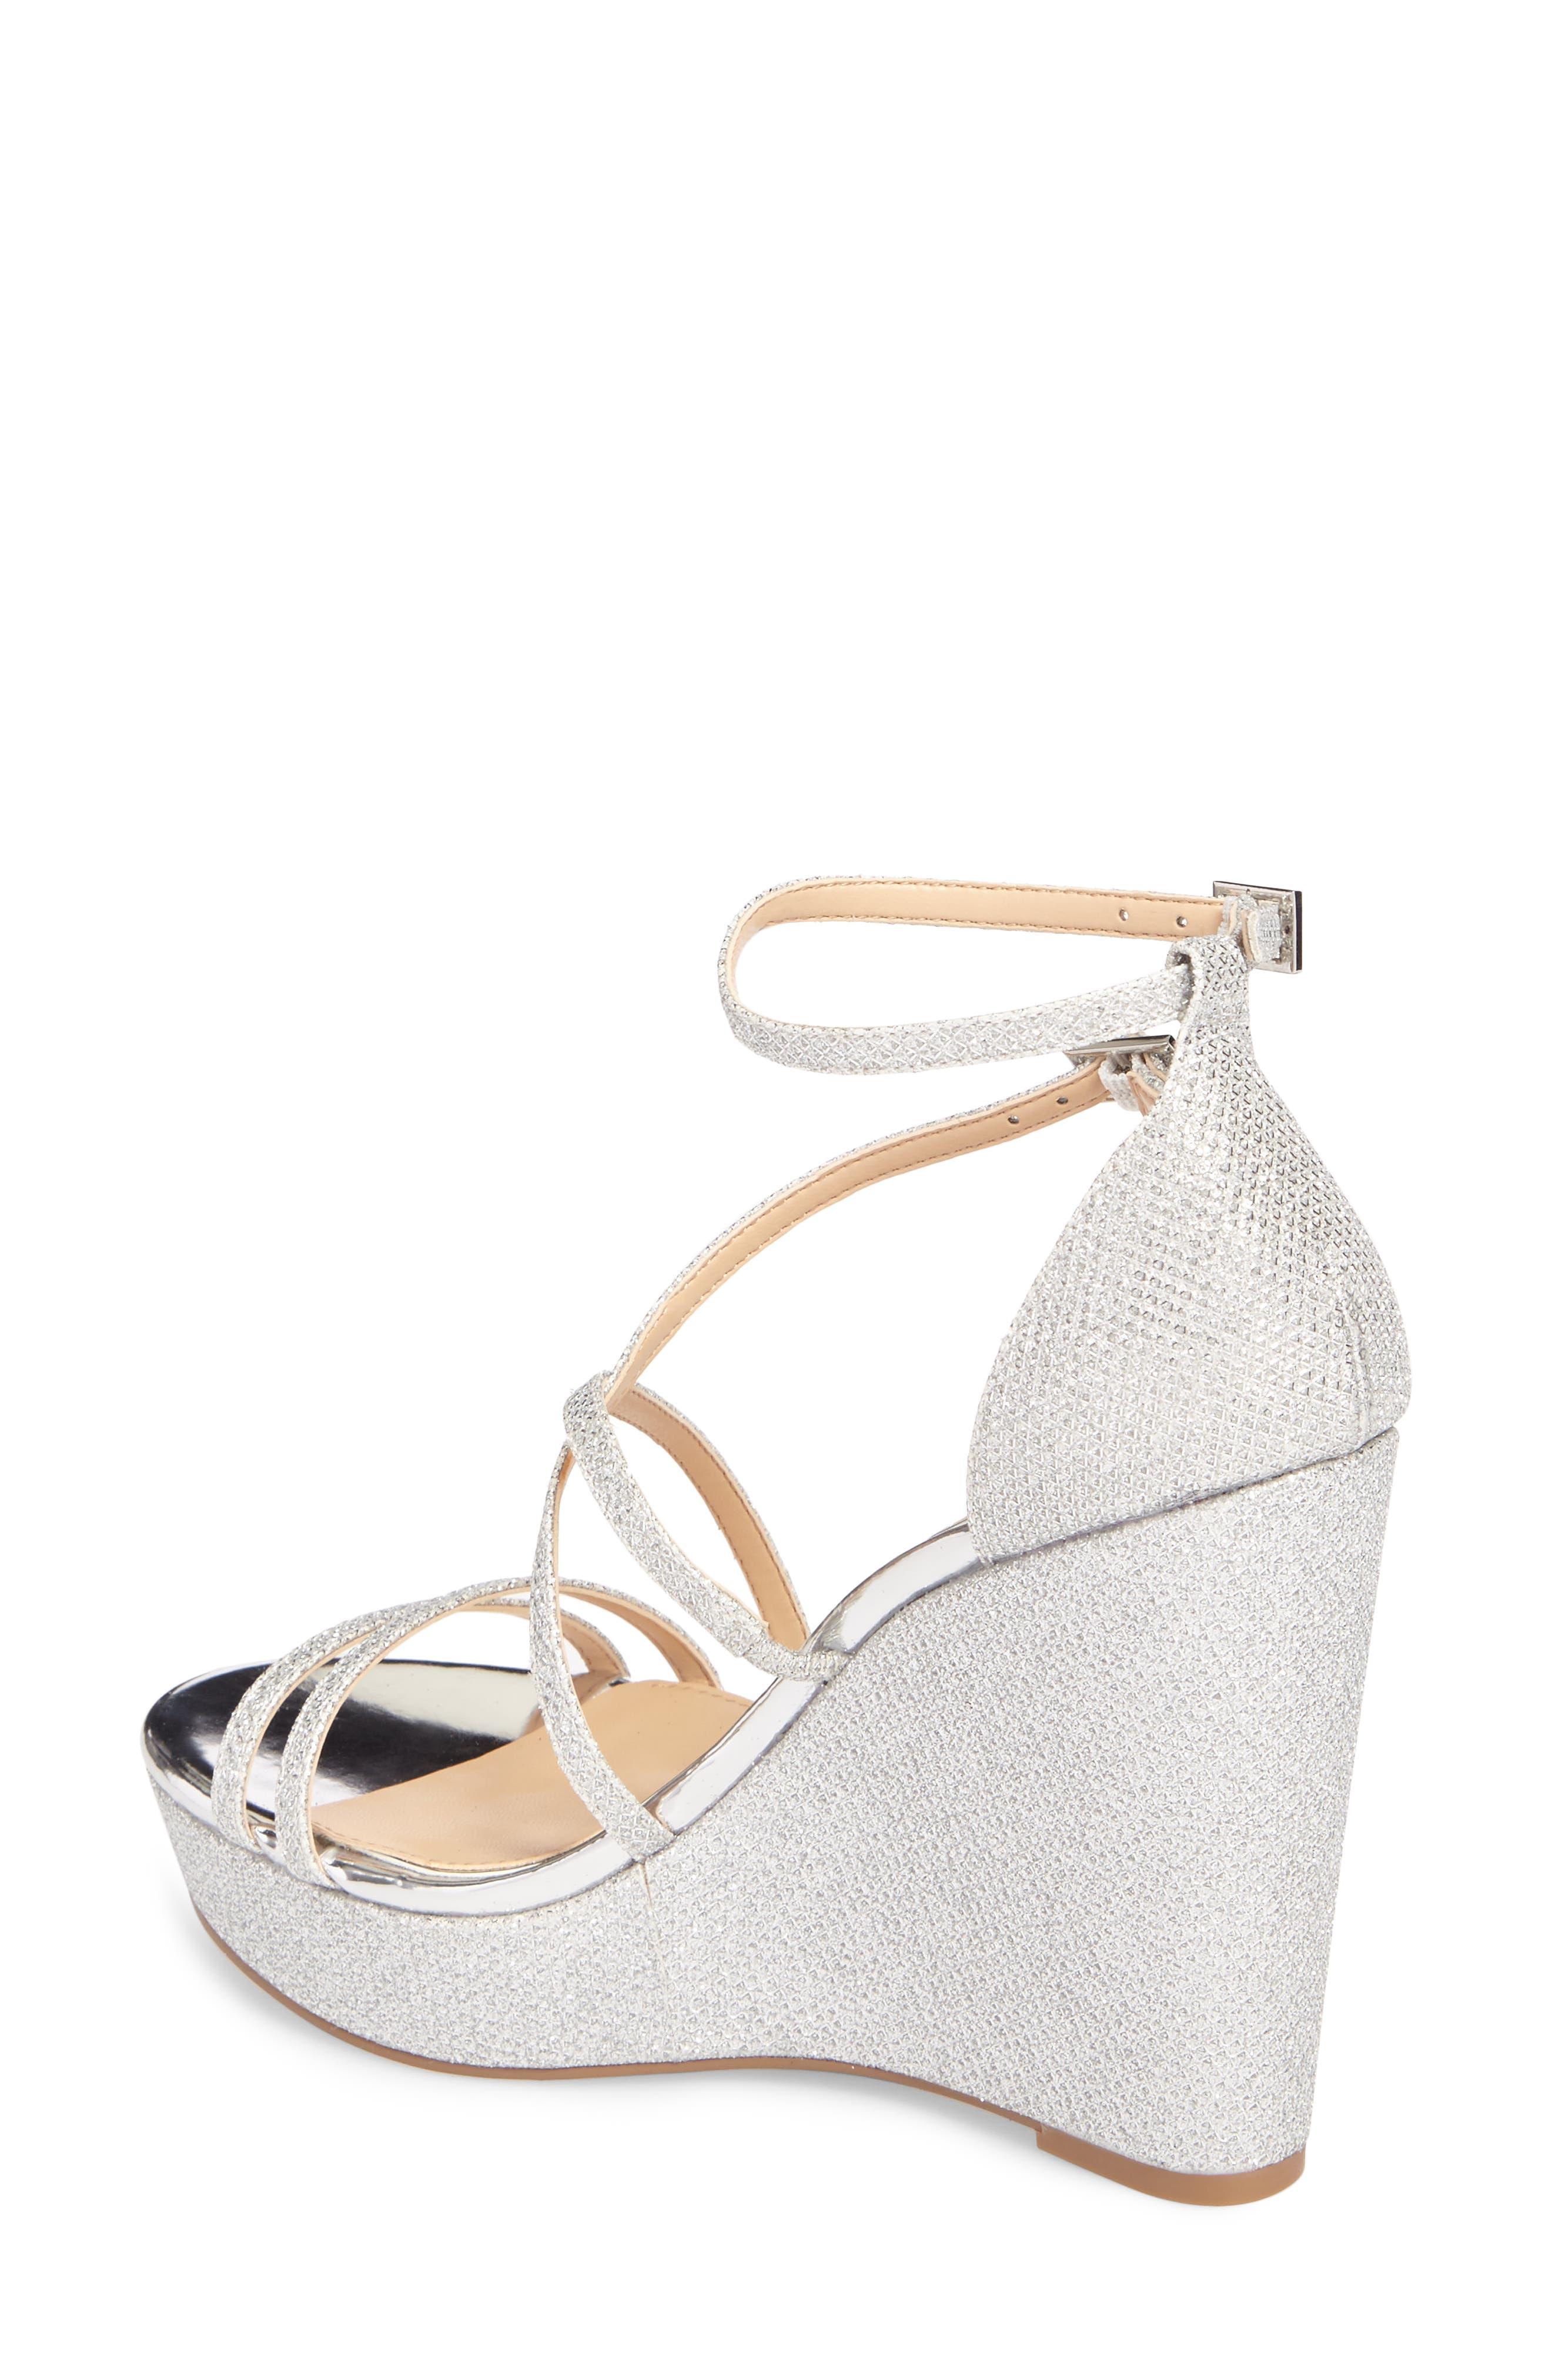 Tatsu Wedge Sandal,                             Alternate thumbnail 2, color,                             Silver Glitter